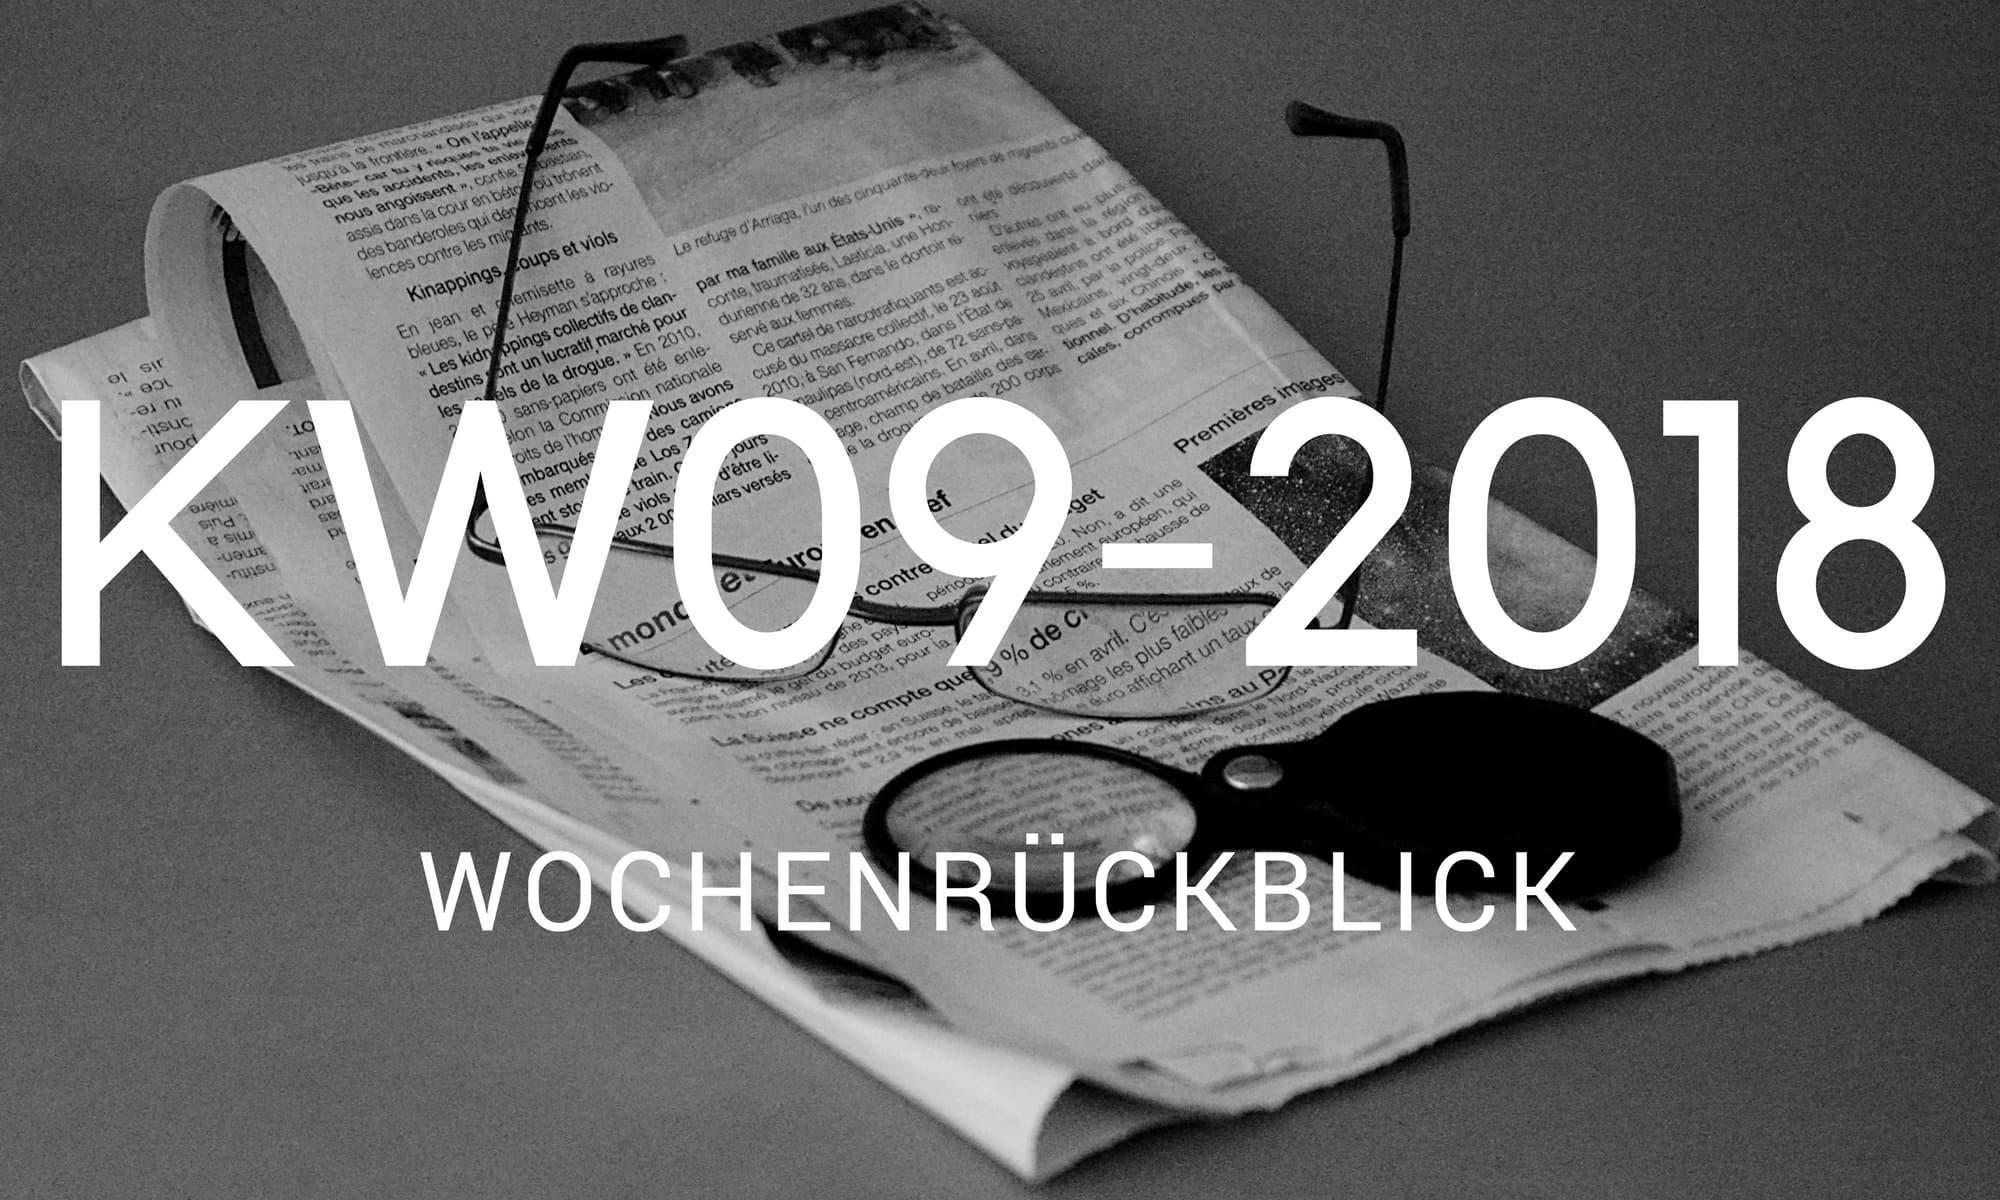 wochenrueckblick camping news-KW09-2018